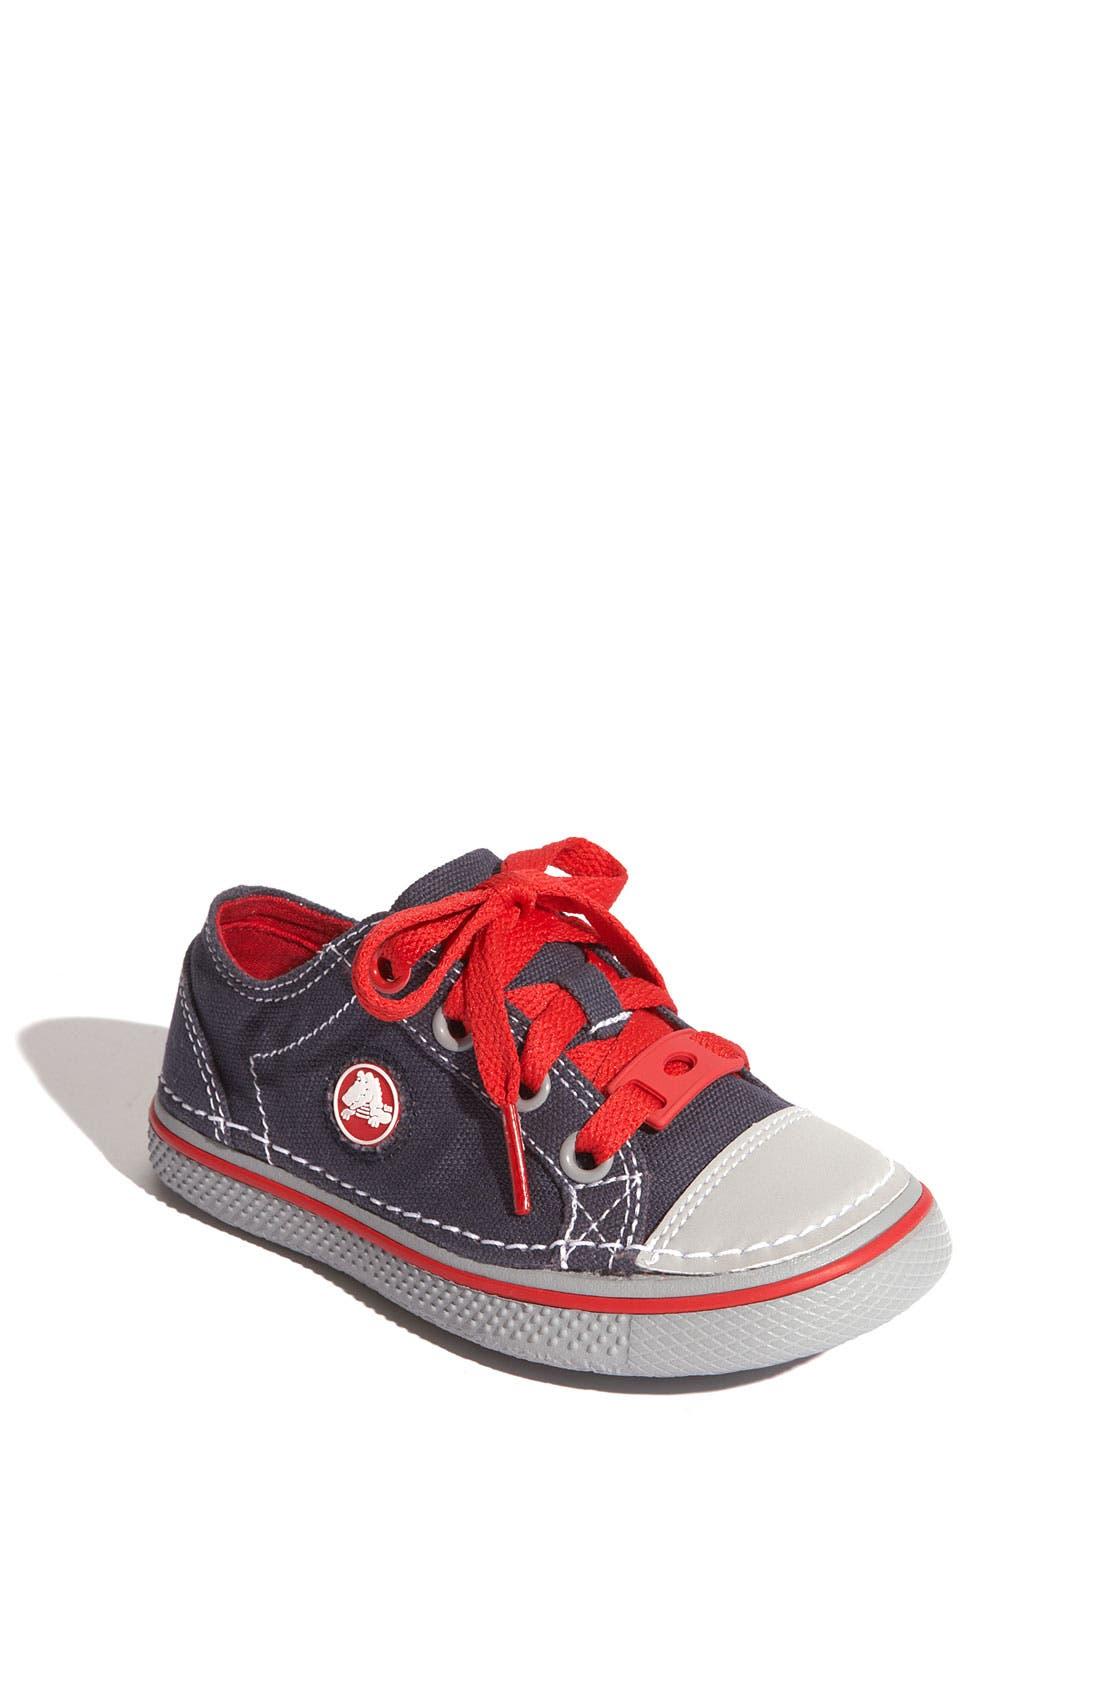 Alternate Image 1 Selected - CROCS™ 'Hover' Sneaker (Toddler, Little Kid & Big Kid)